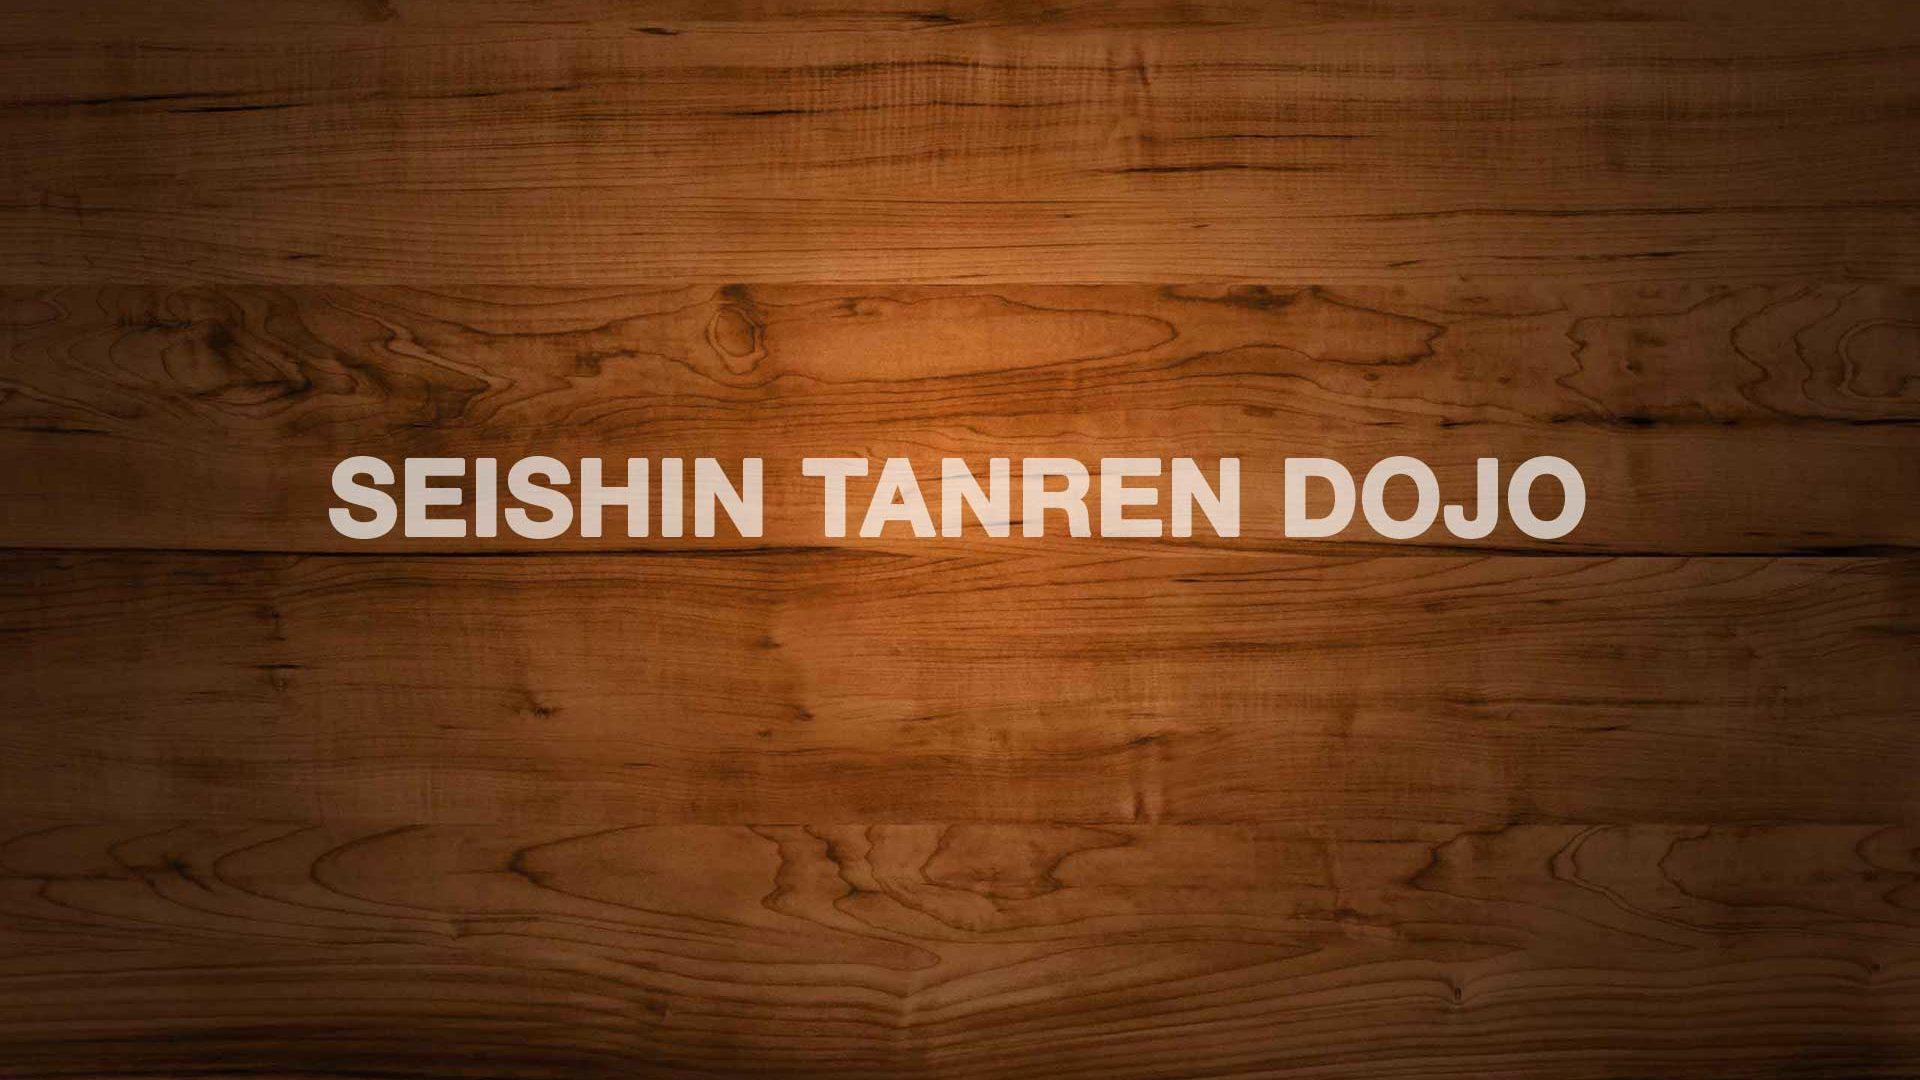 Seishin Tanren Dojo